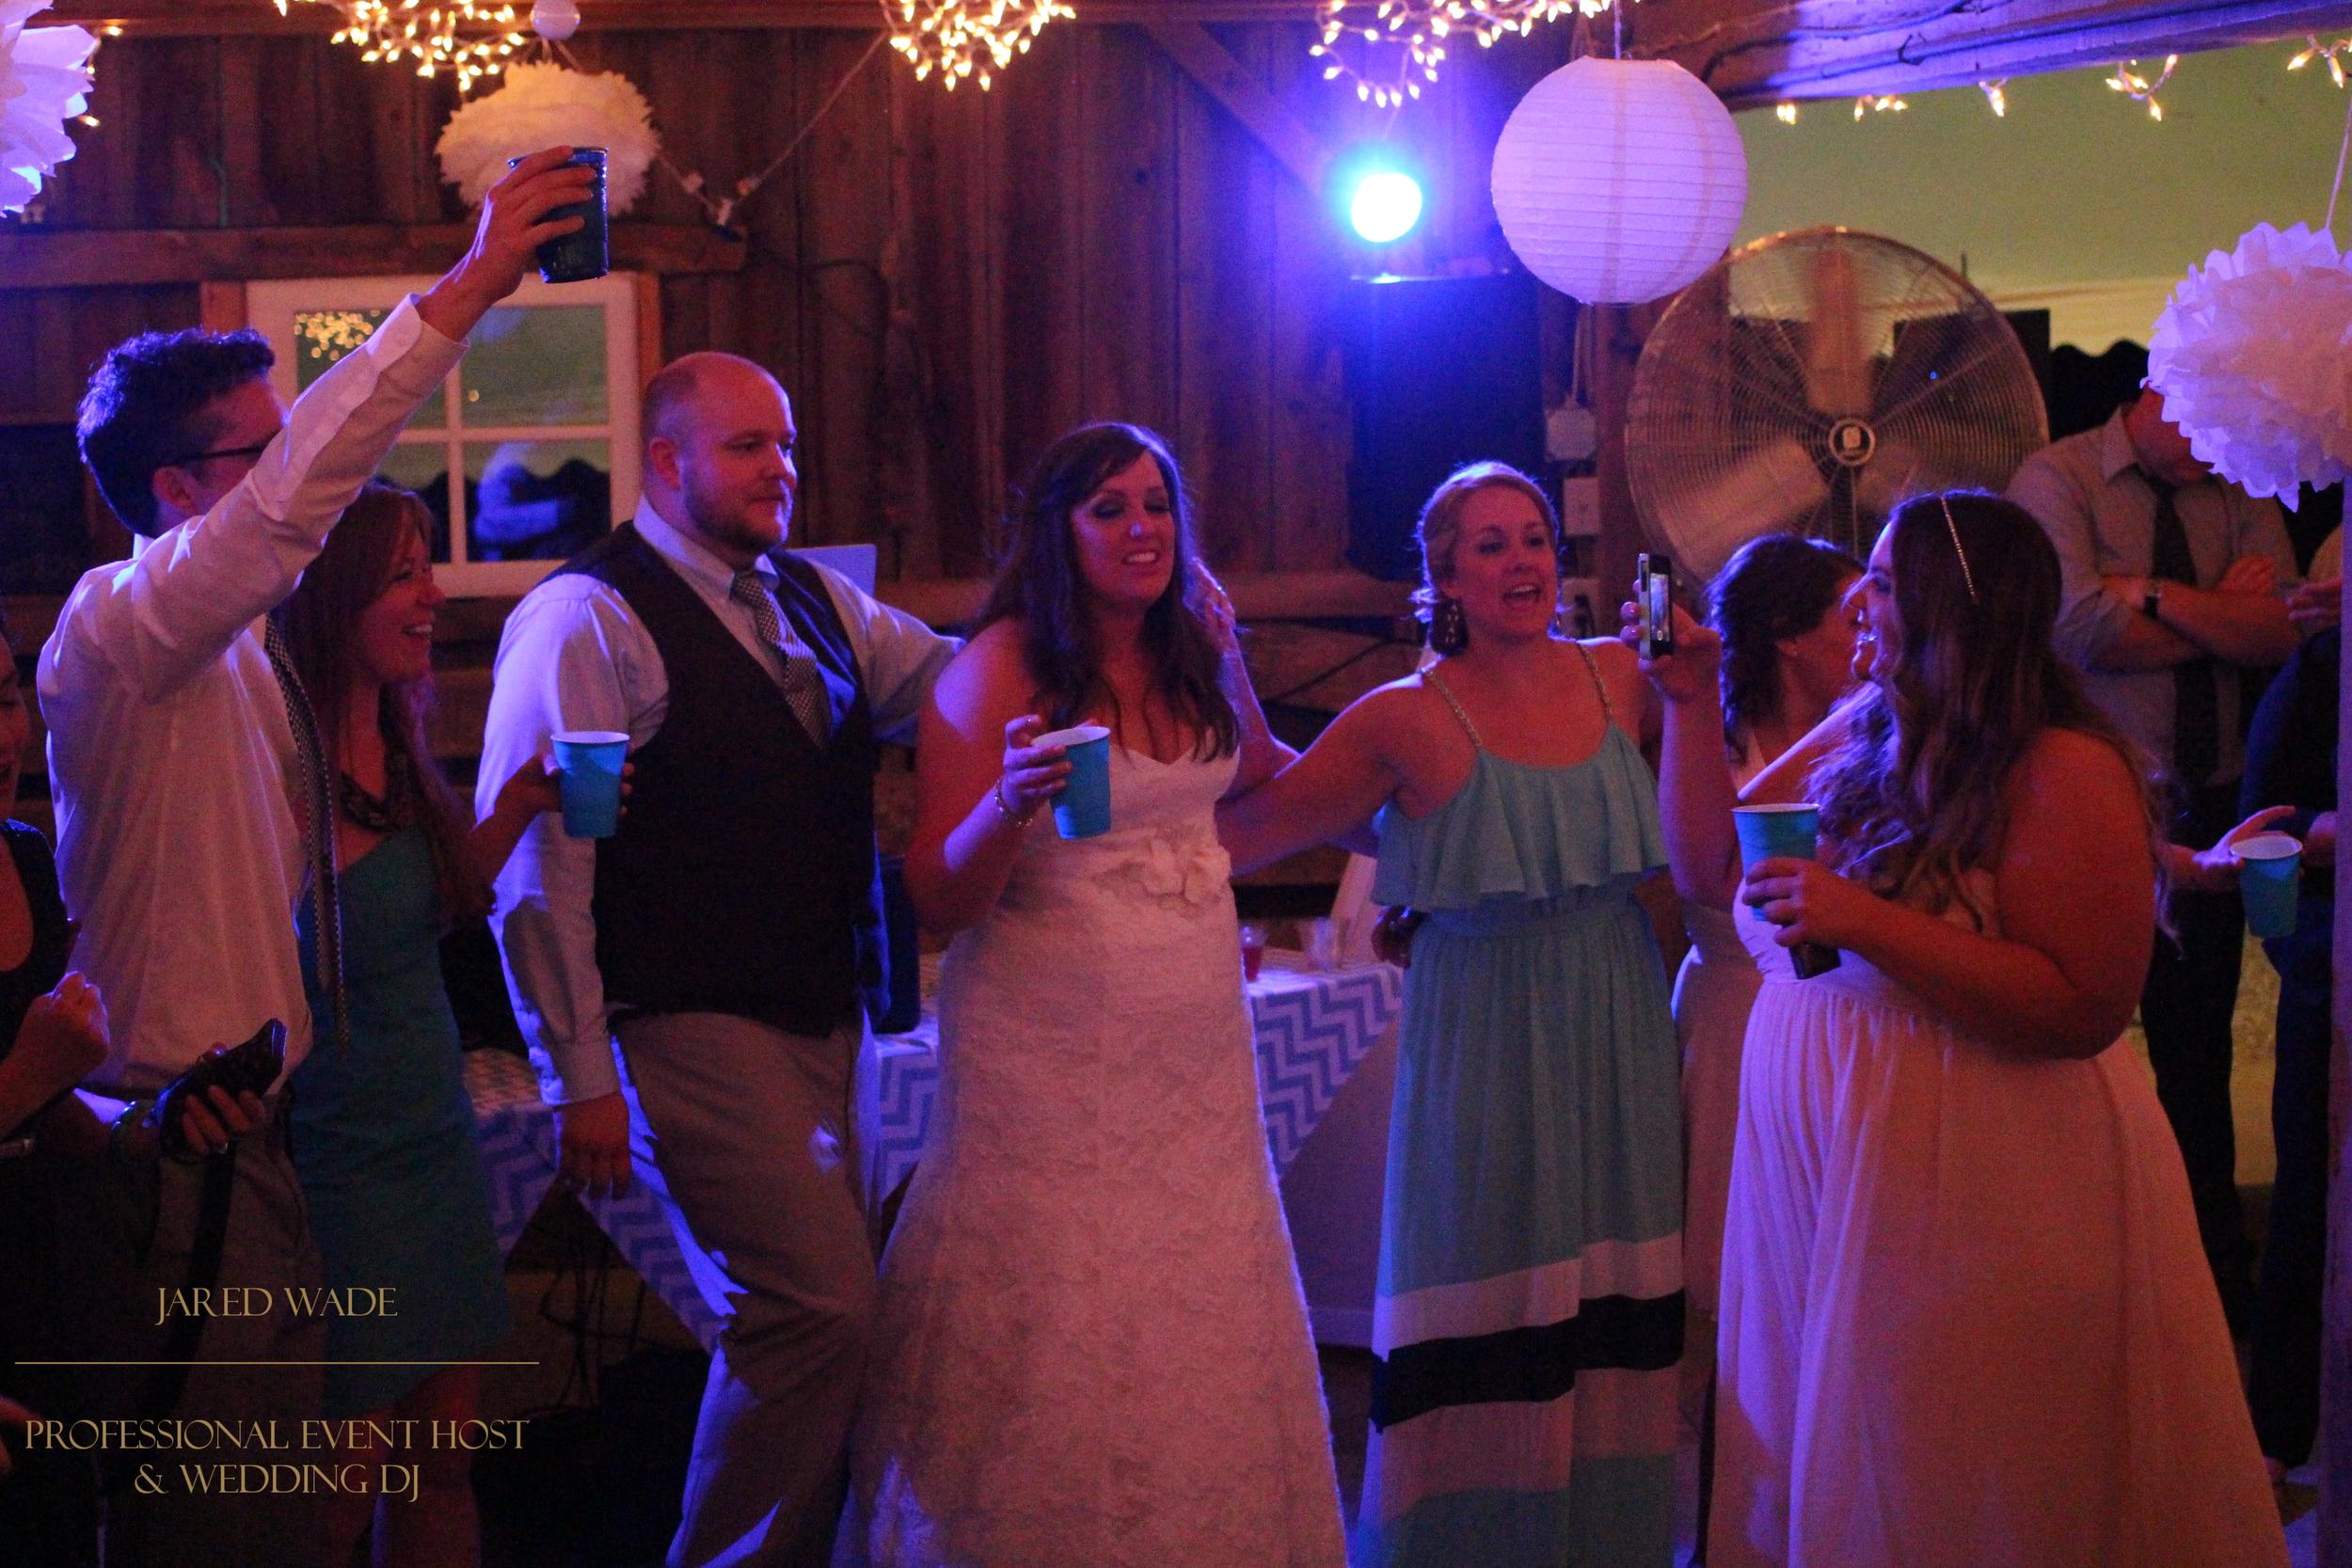 Jared Wade Professional Event Host | Indianapolis Wedding DJ | Indiana Barn Wedding | Dulls Tree Farm